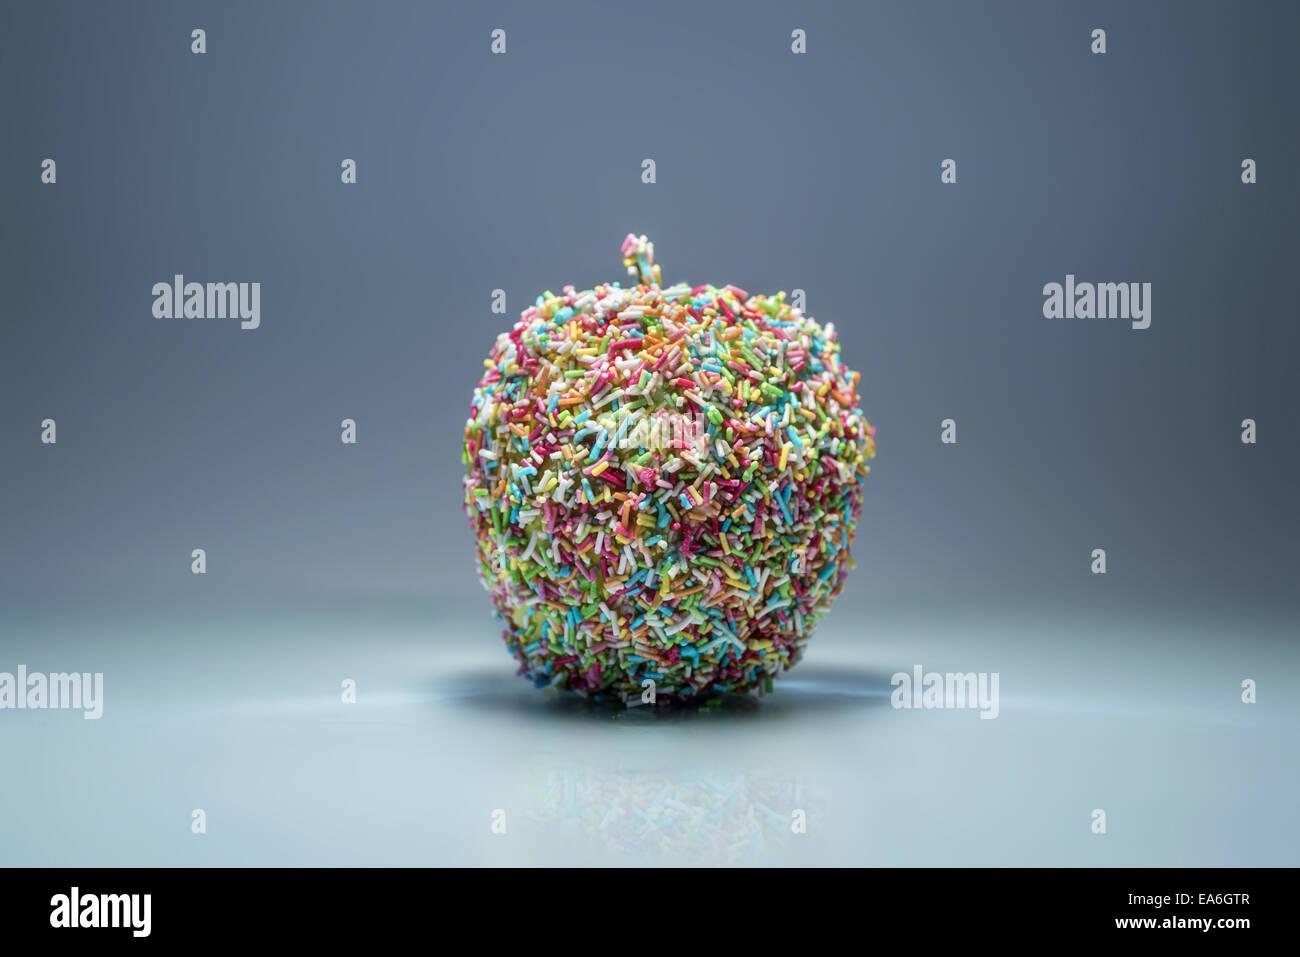 Couvert de Apple sprinkles multicolores Photo Stock